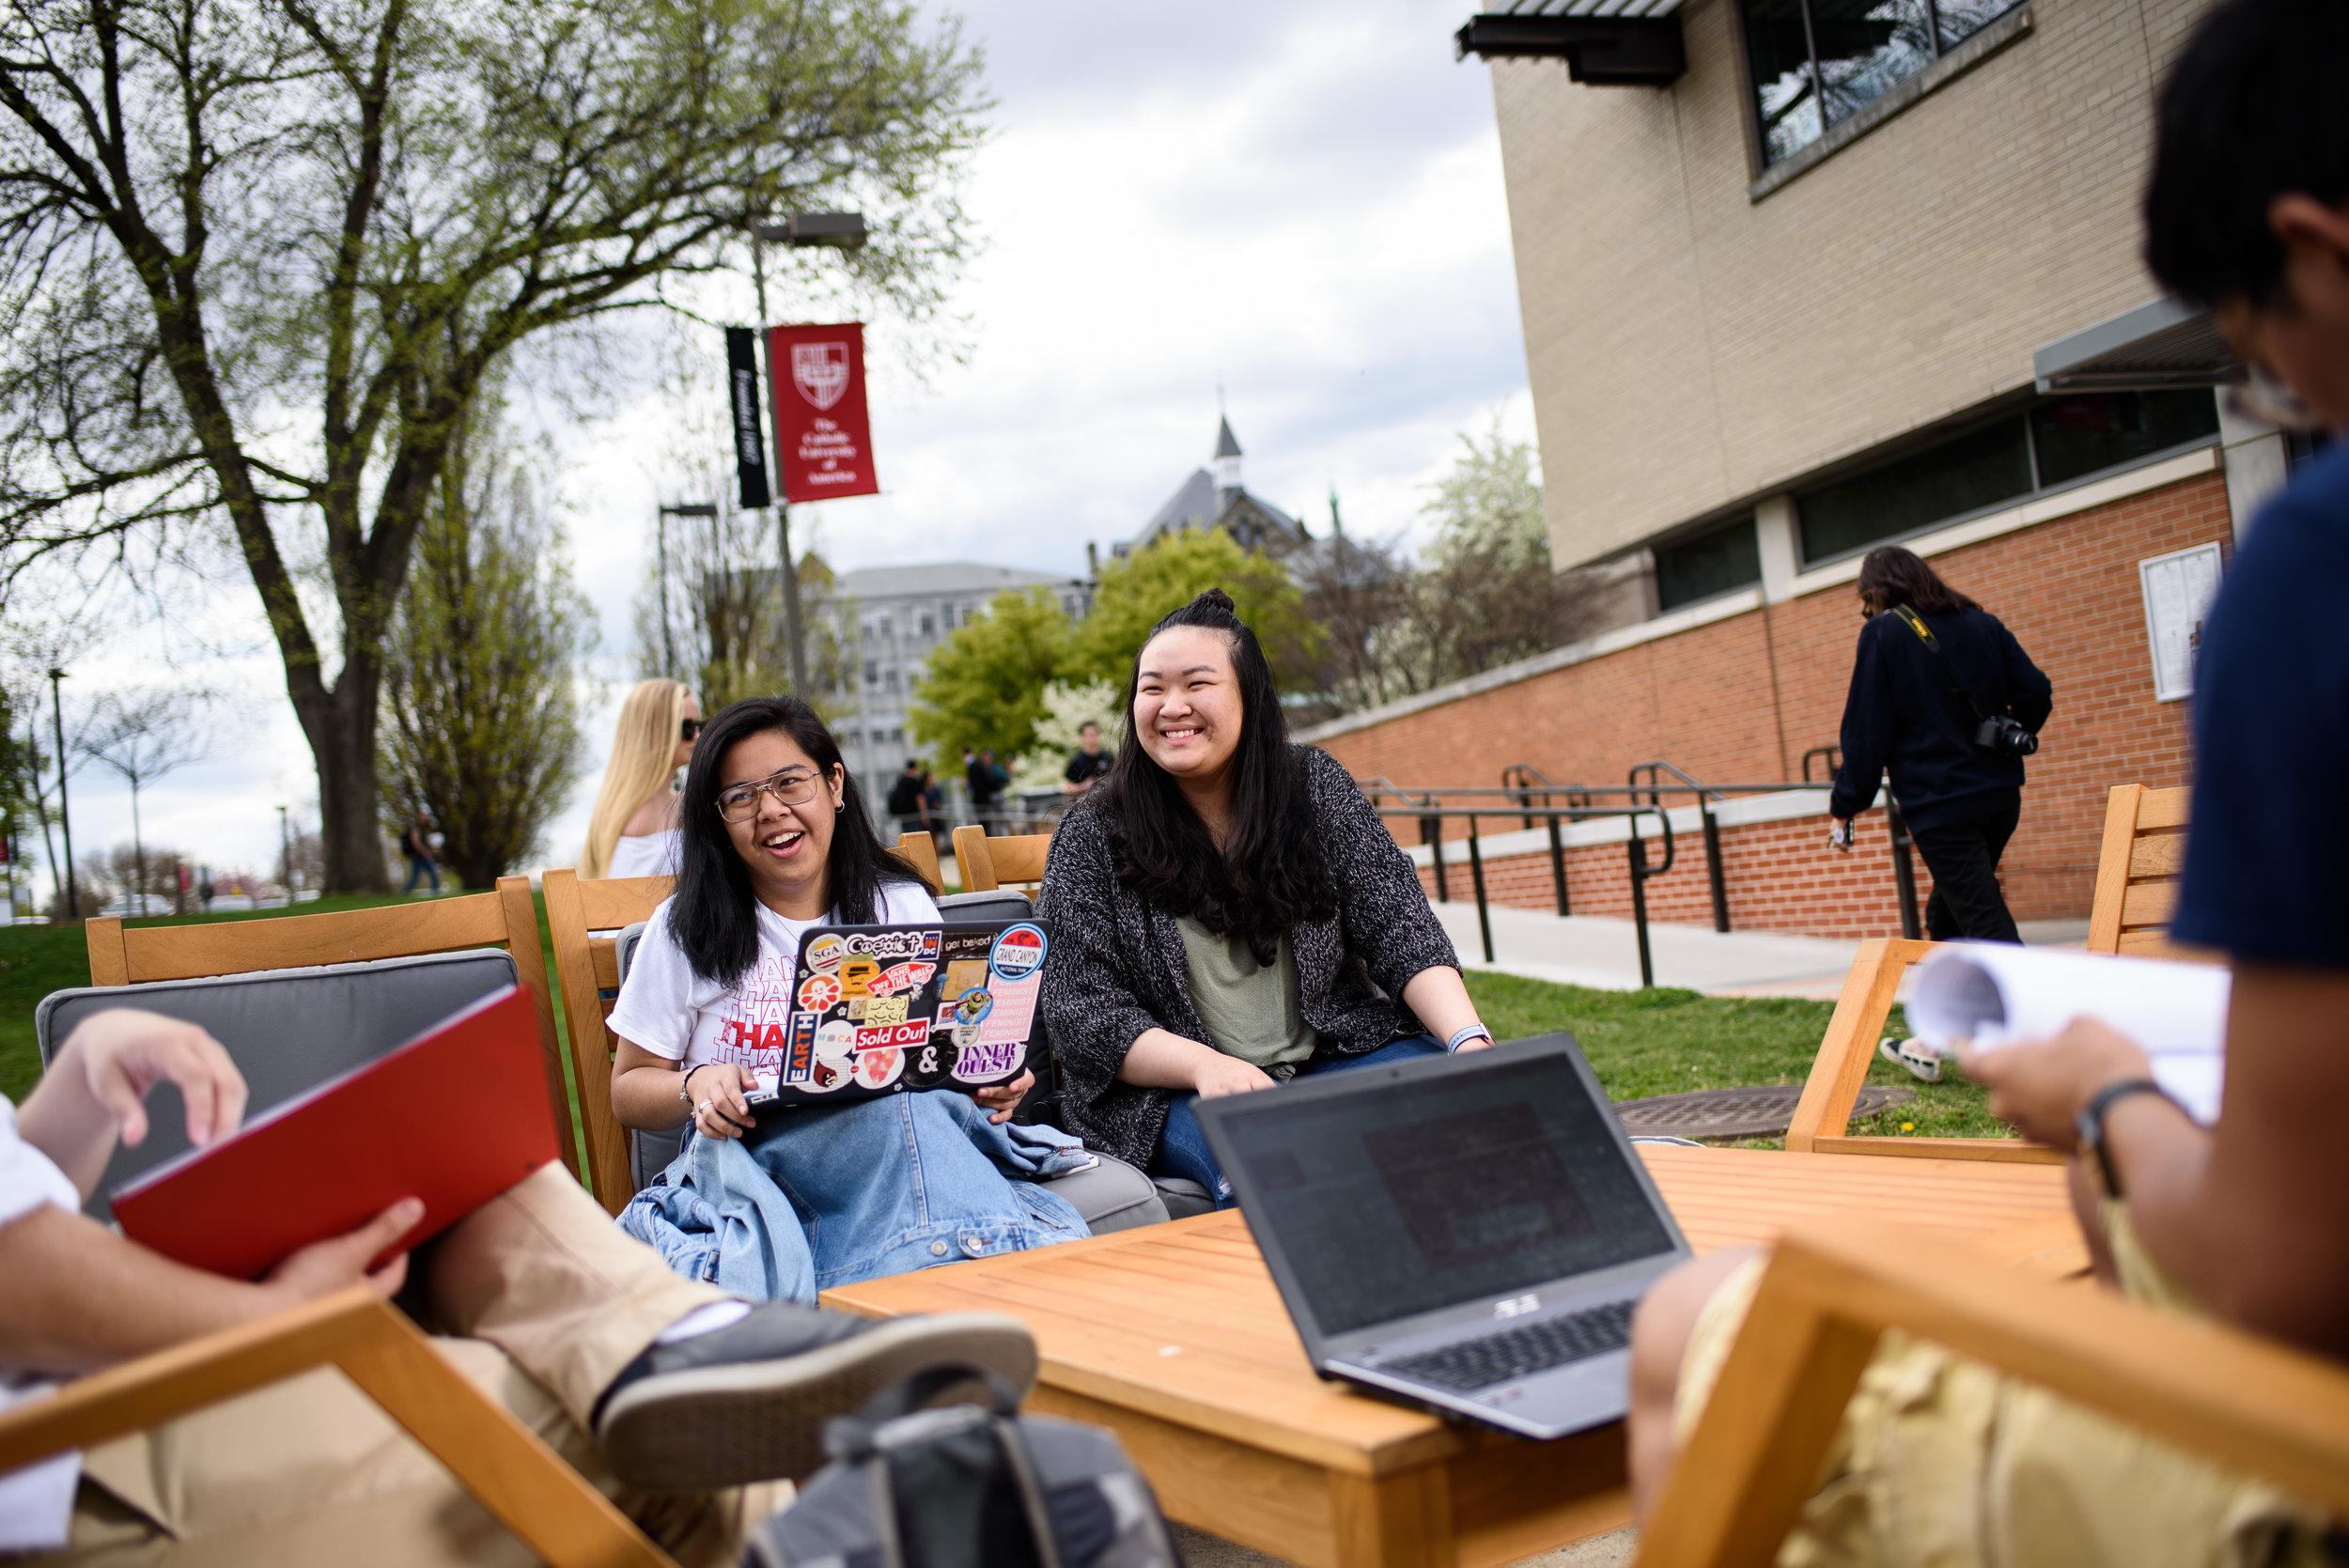 Catholic University students sitting at the benches outside of the Pryz.